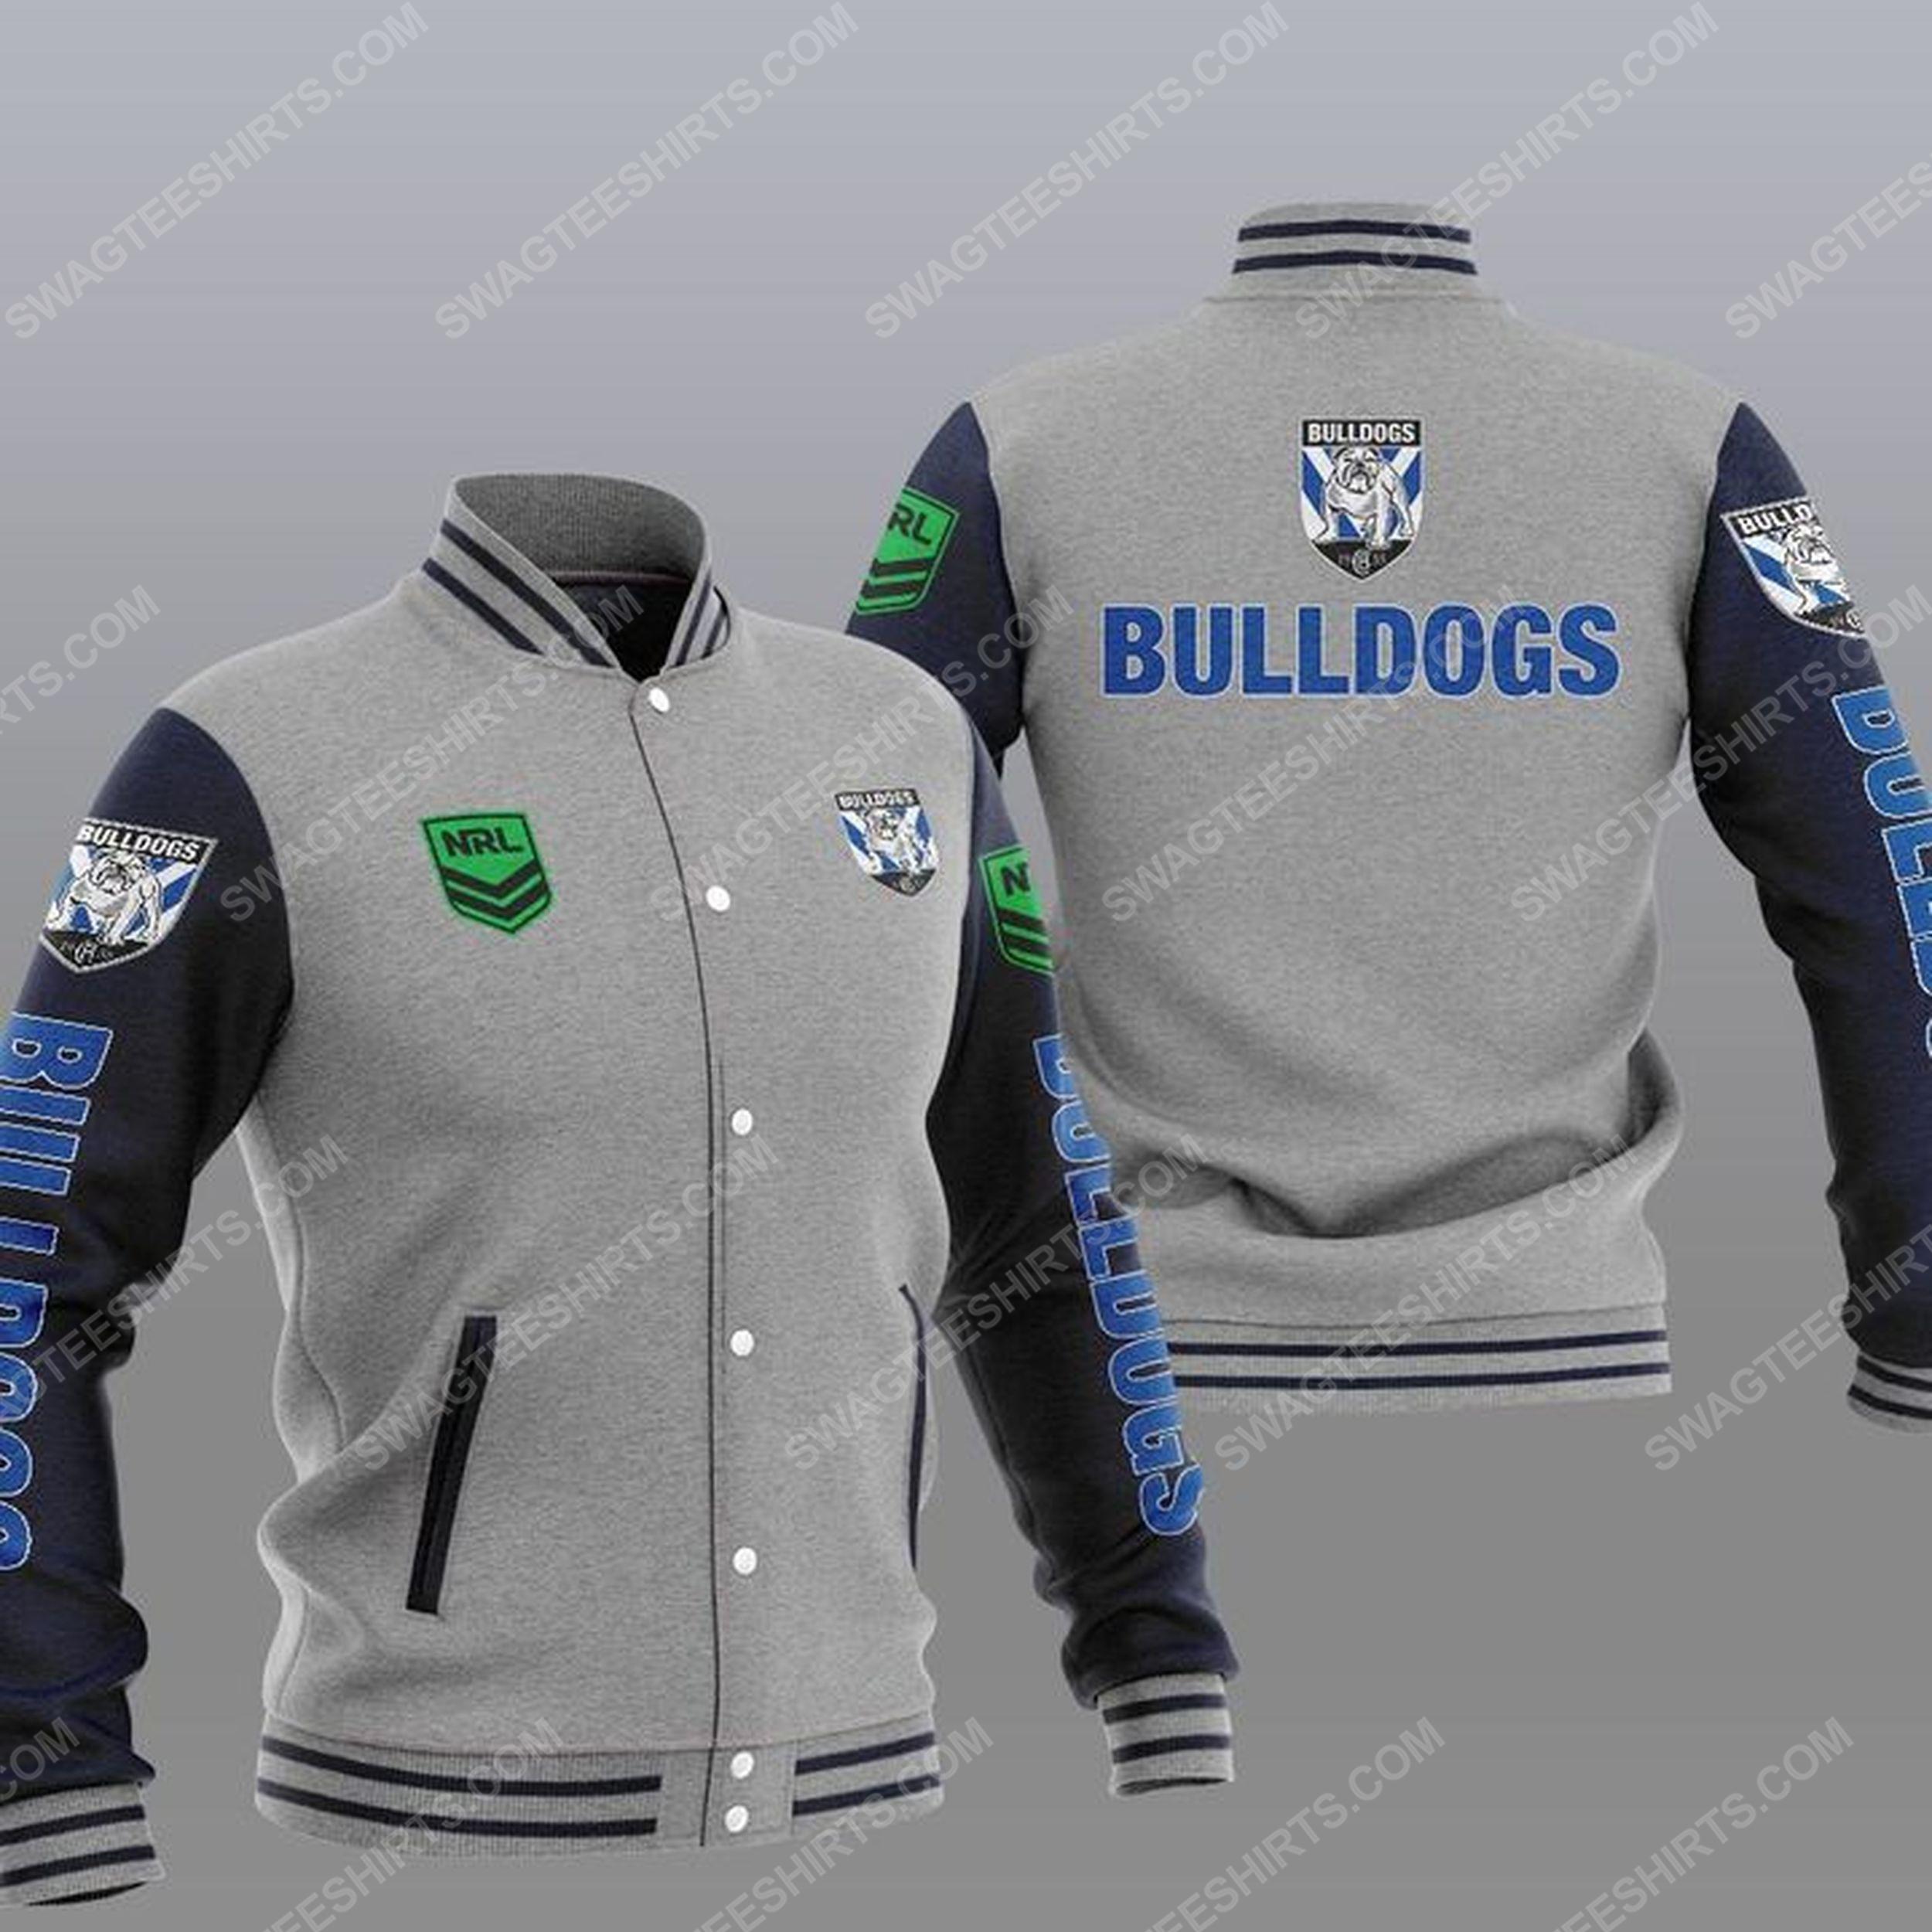 Canterbury-bankstown bulldogs all over print baseball jacket - gray 1